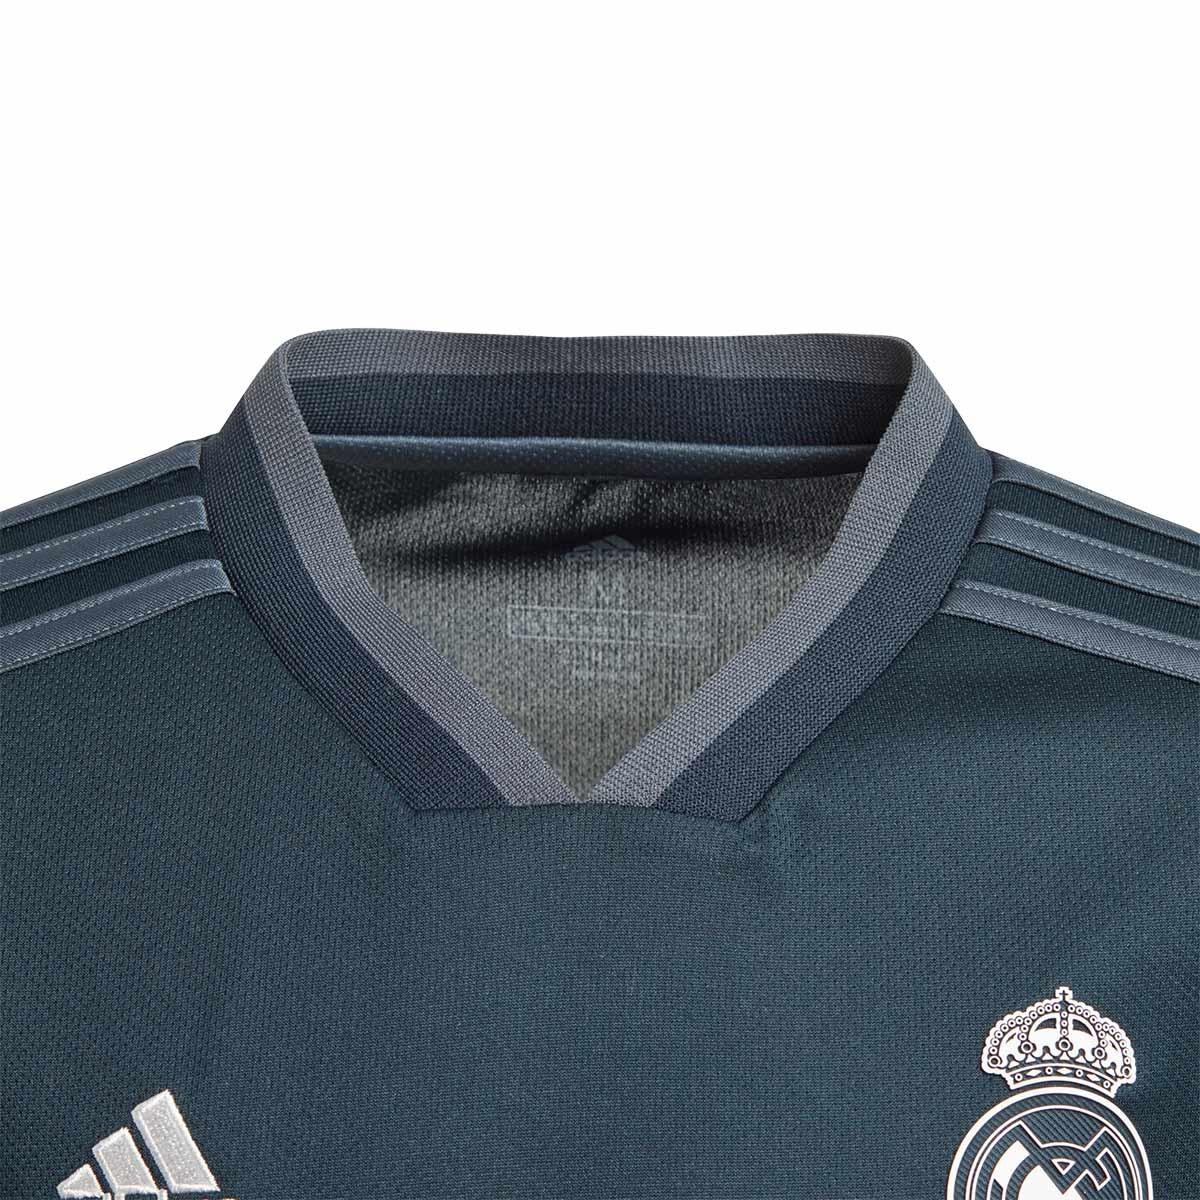 610e4959a6b3 Jersey adidas Kids Real Madrid LS 2018-2019 Away Tech onix-Bold onix-White  - Tienda de fútbol Fútbol Emotion